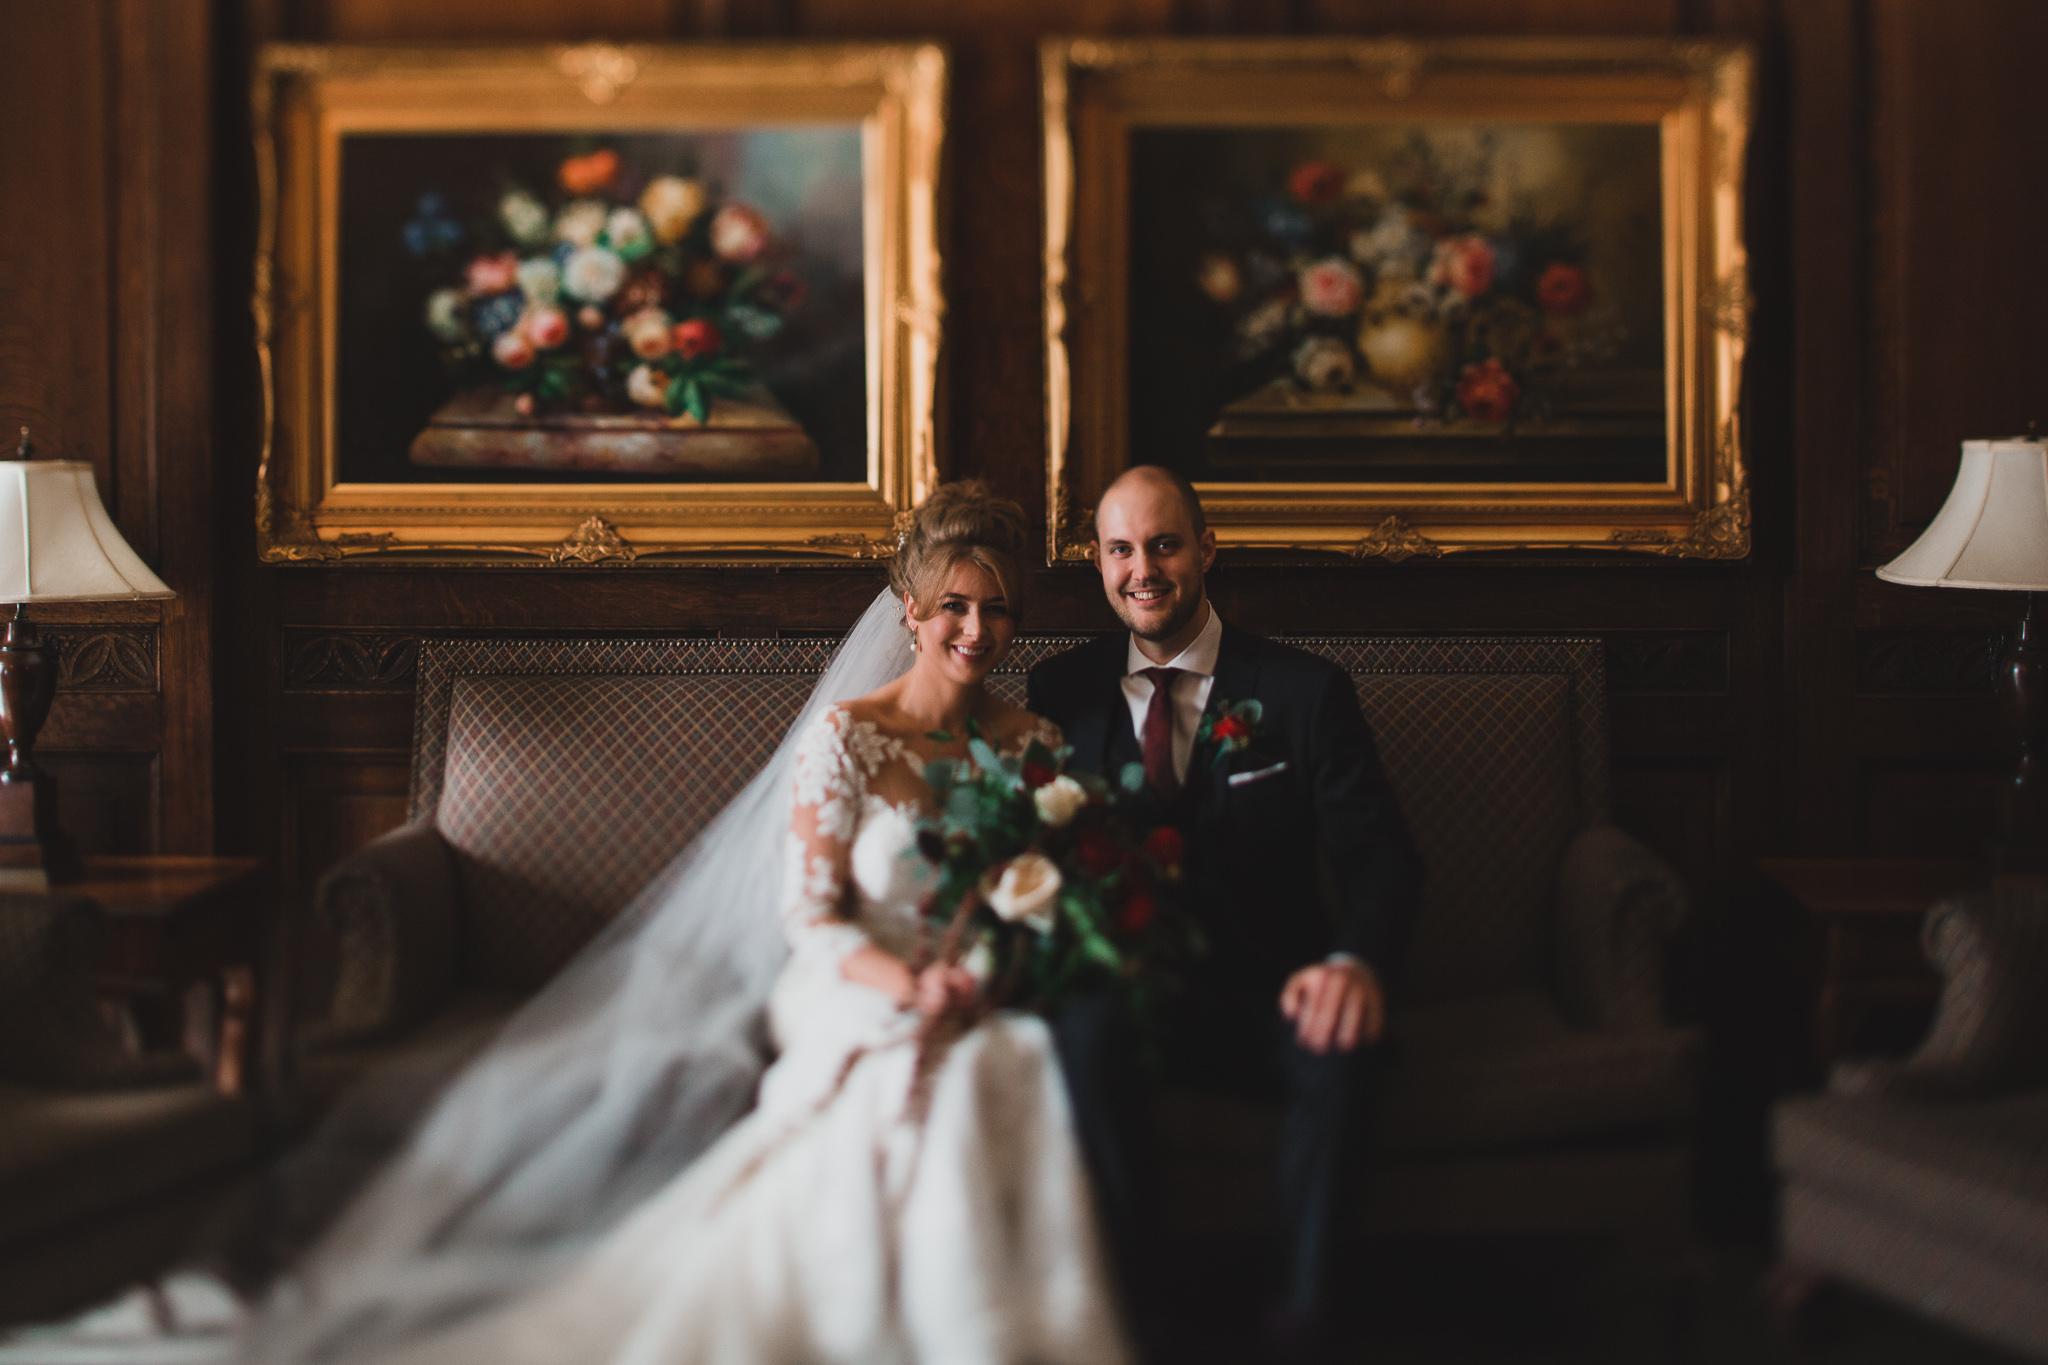 Chateau Laurier wedding portrait Jonathan Kuhn